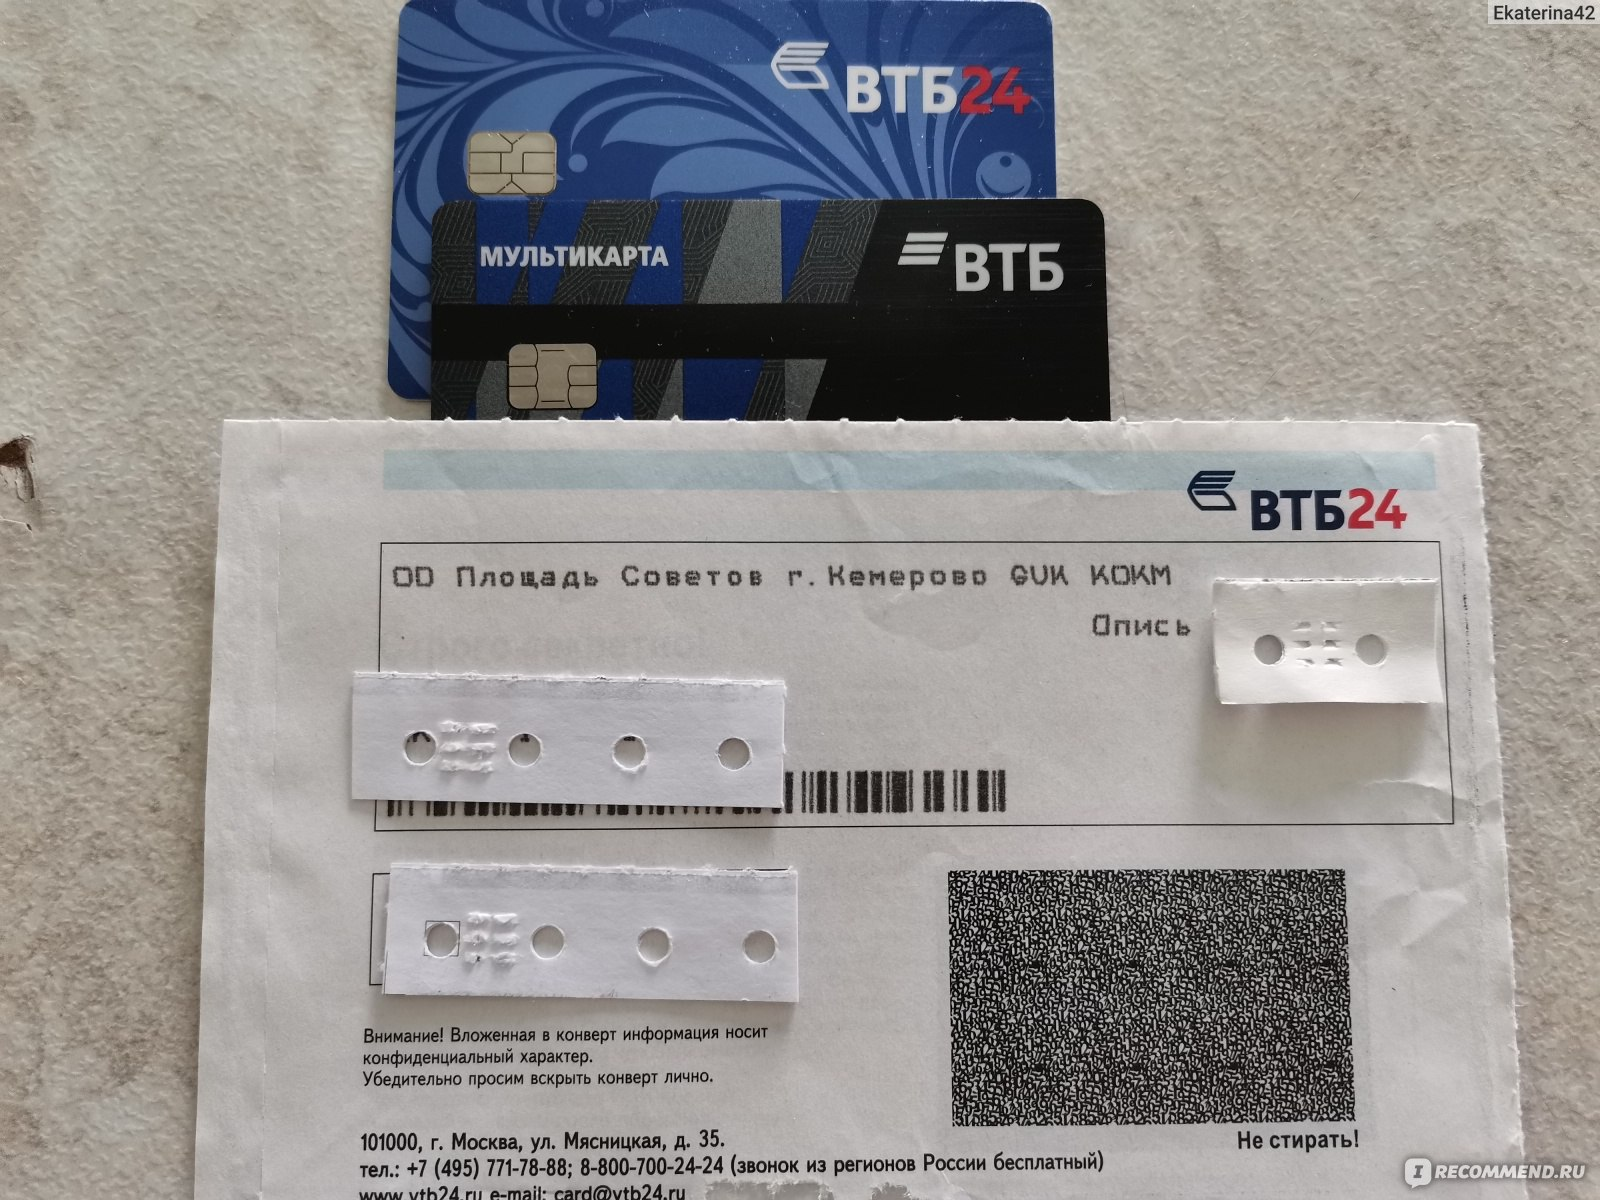 оставить заявку на кредит в отп банке онлайн заявка на кредит